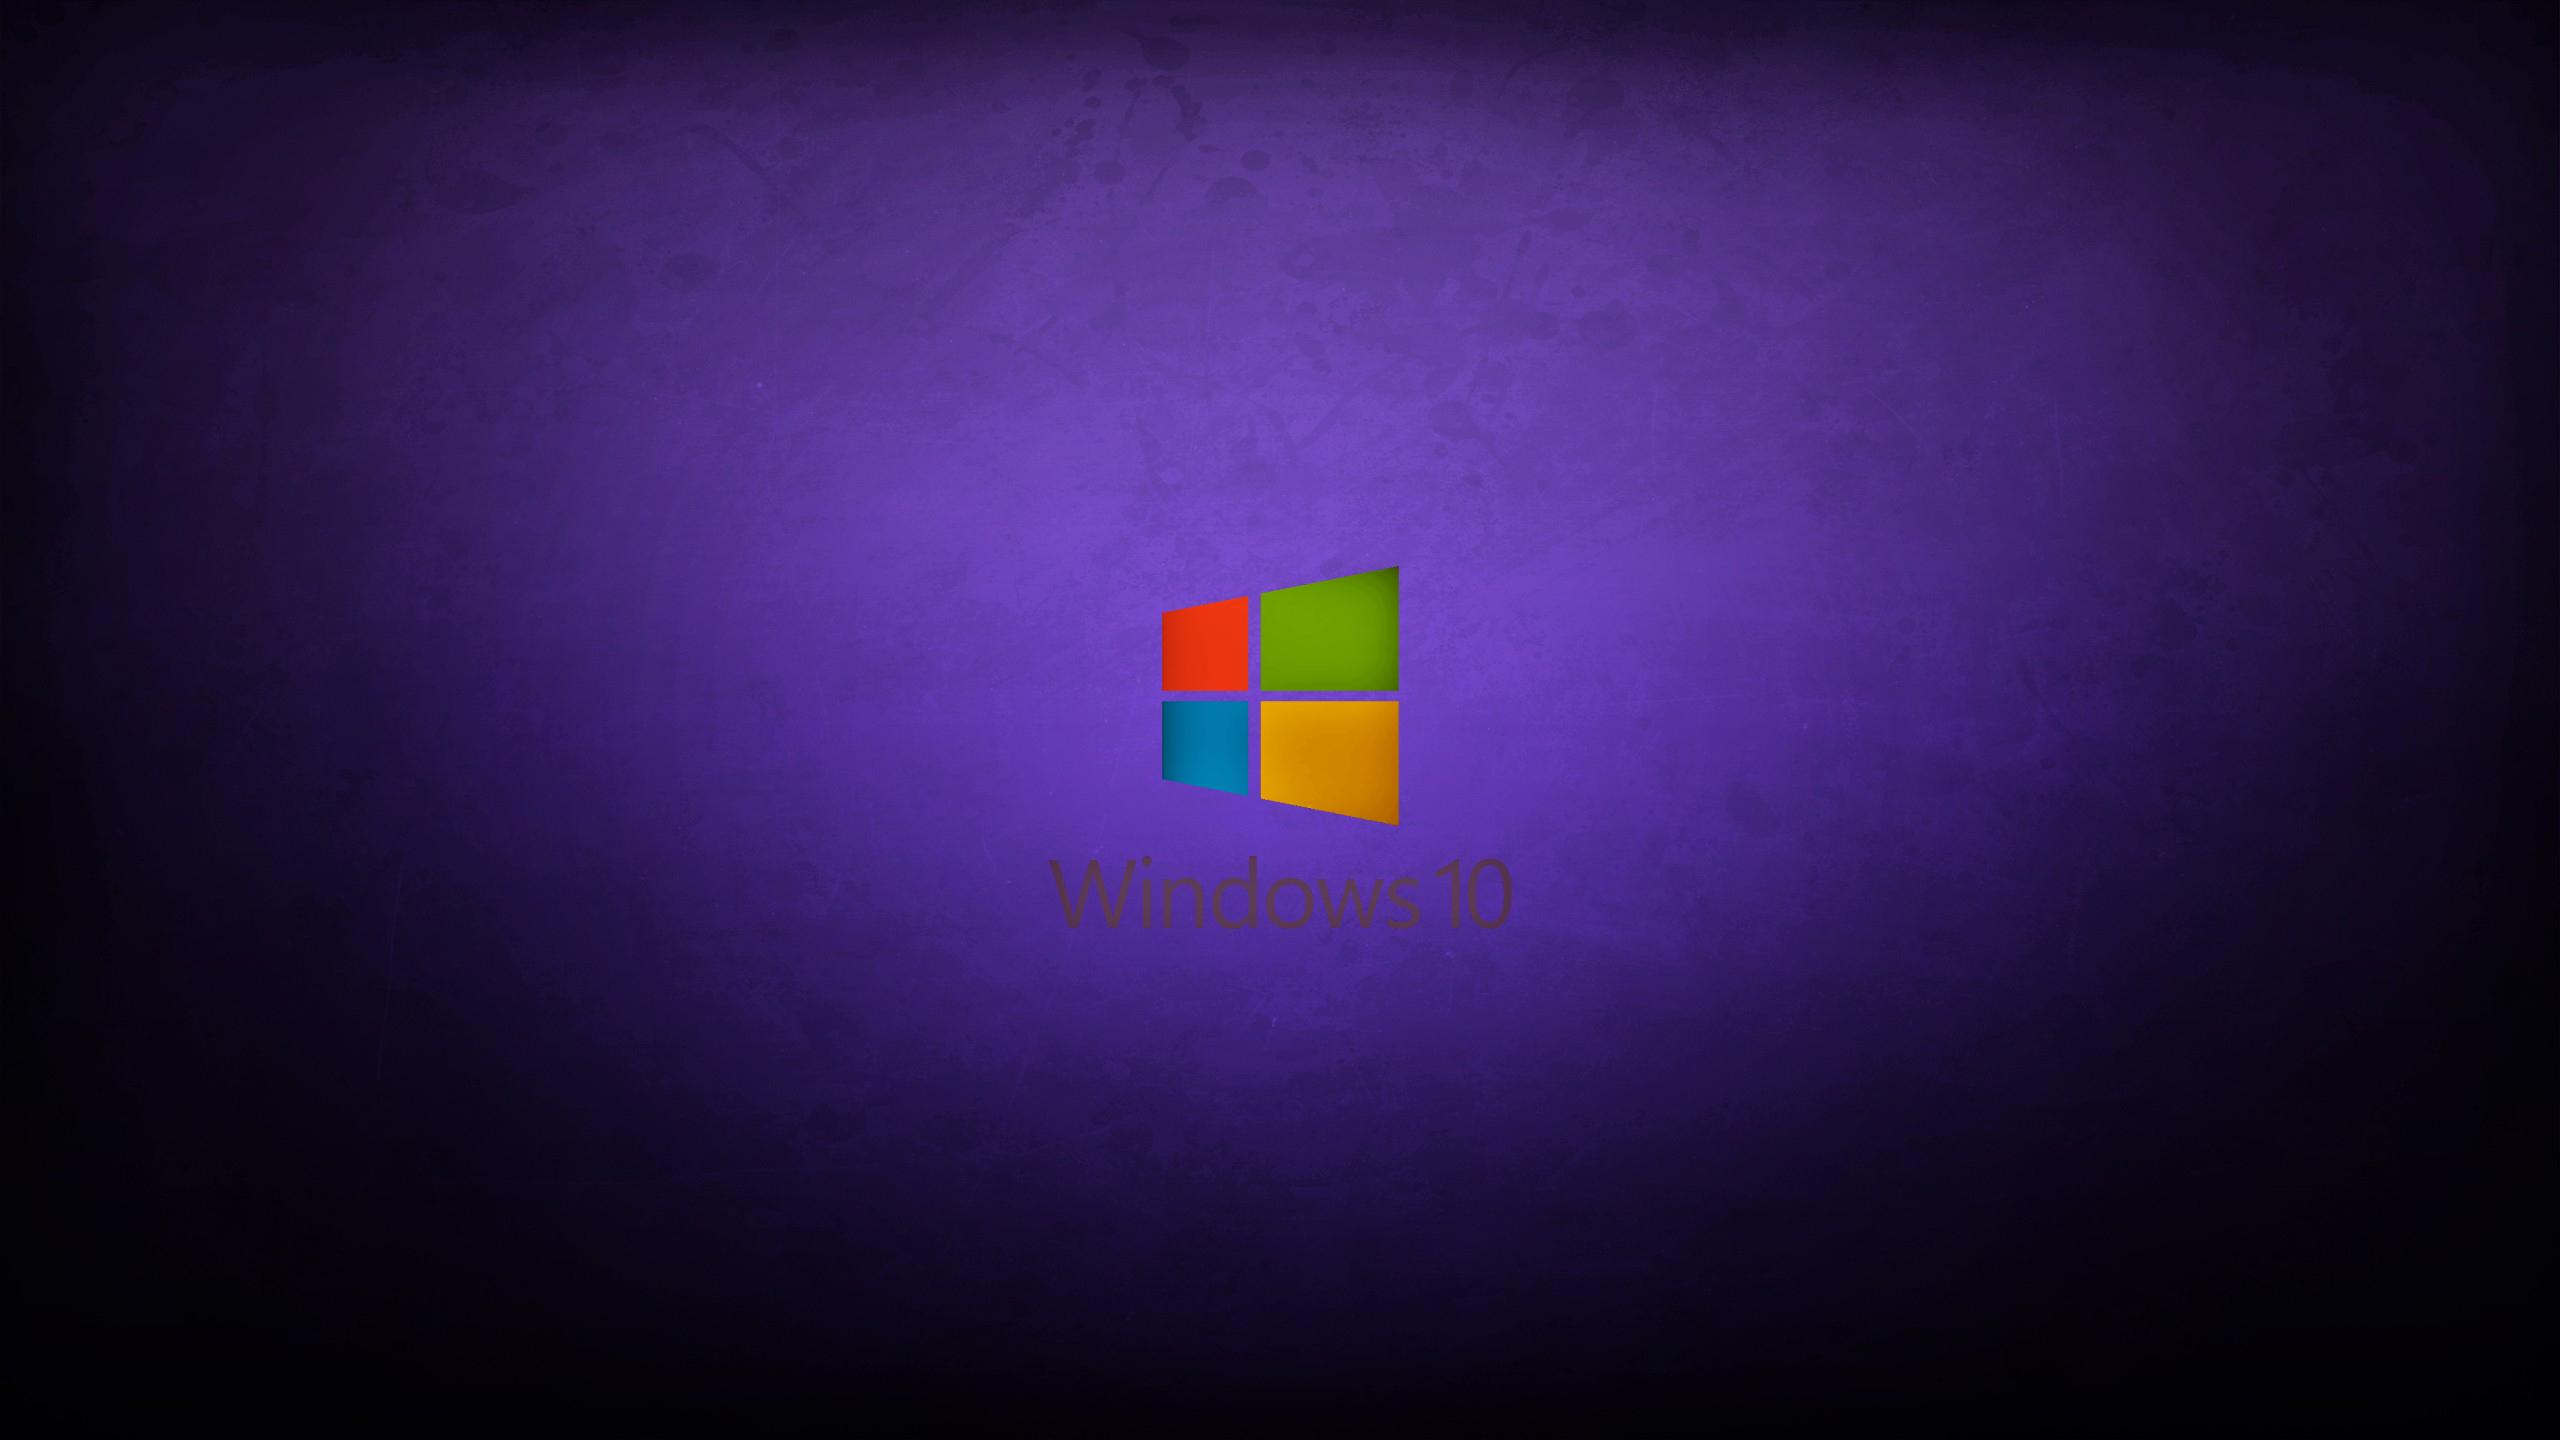 [49+] Purple Windows 10 Wallpaper On WallpaperSafari